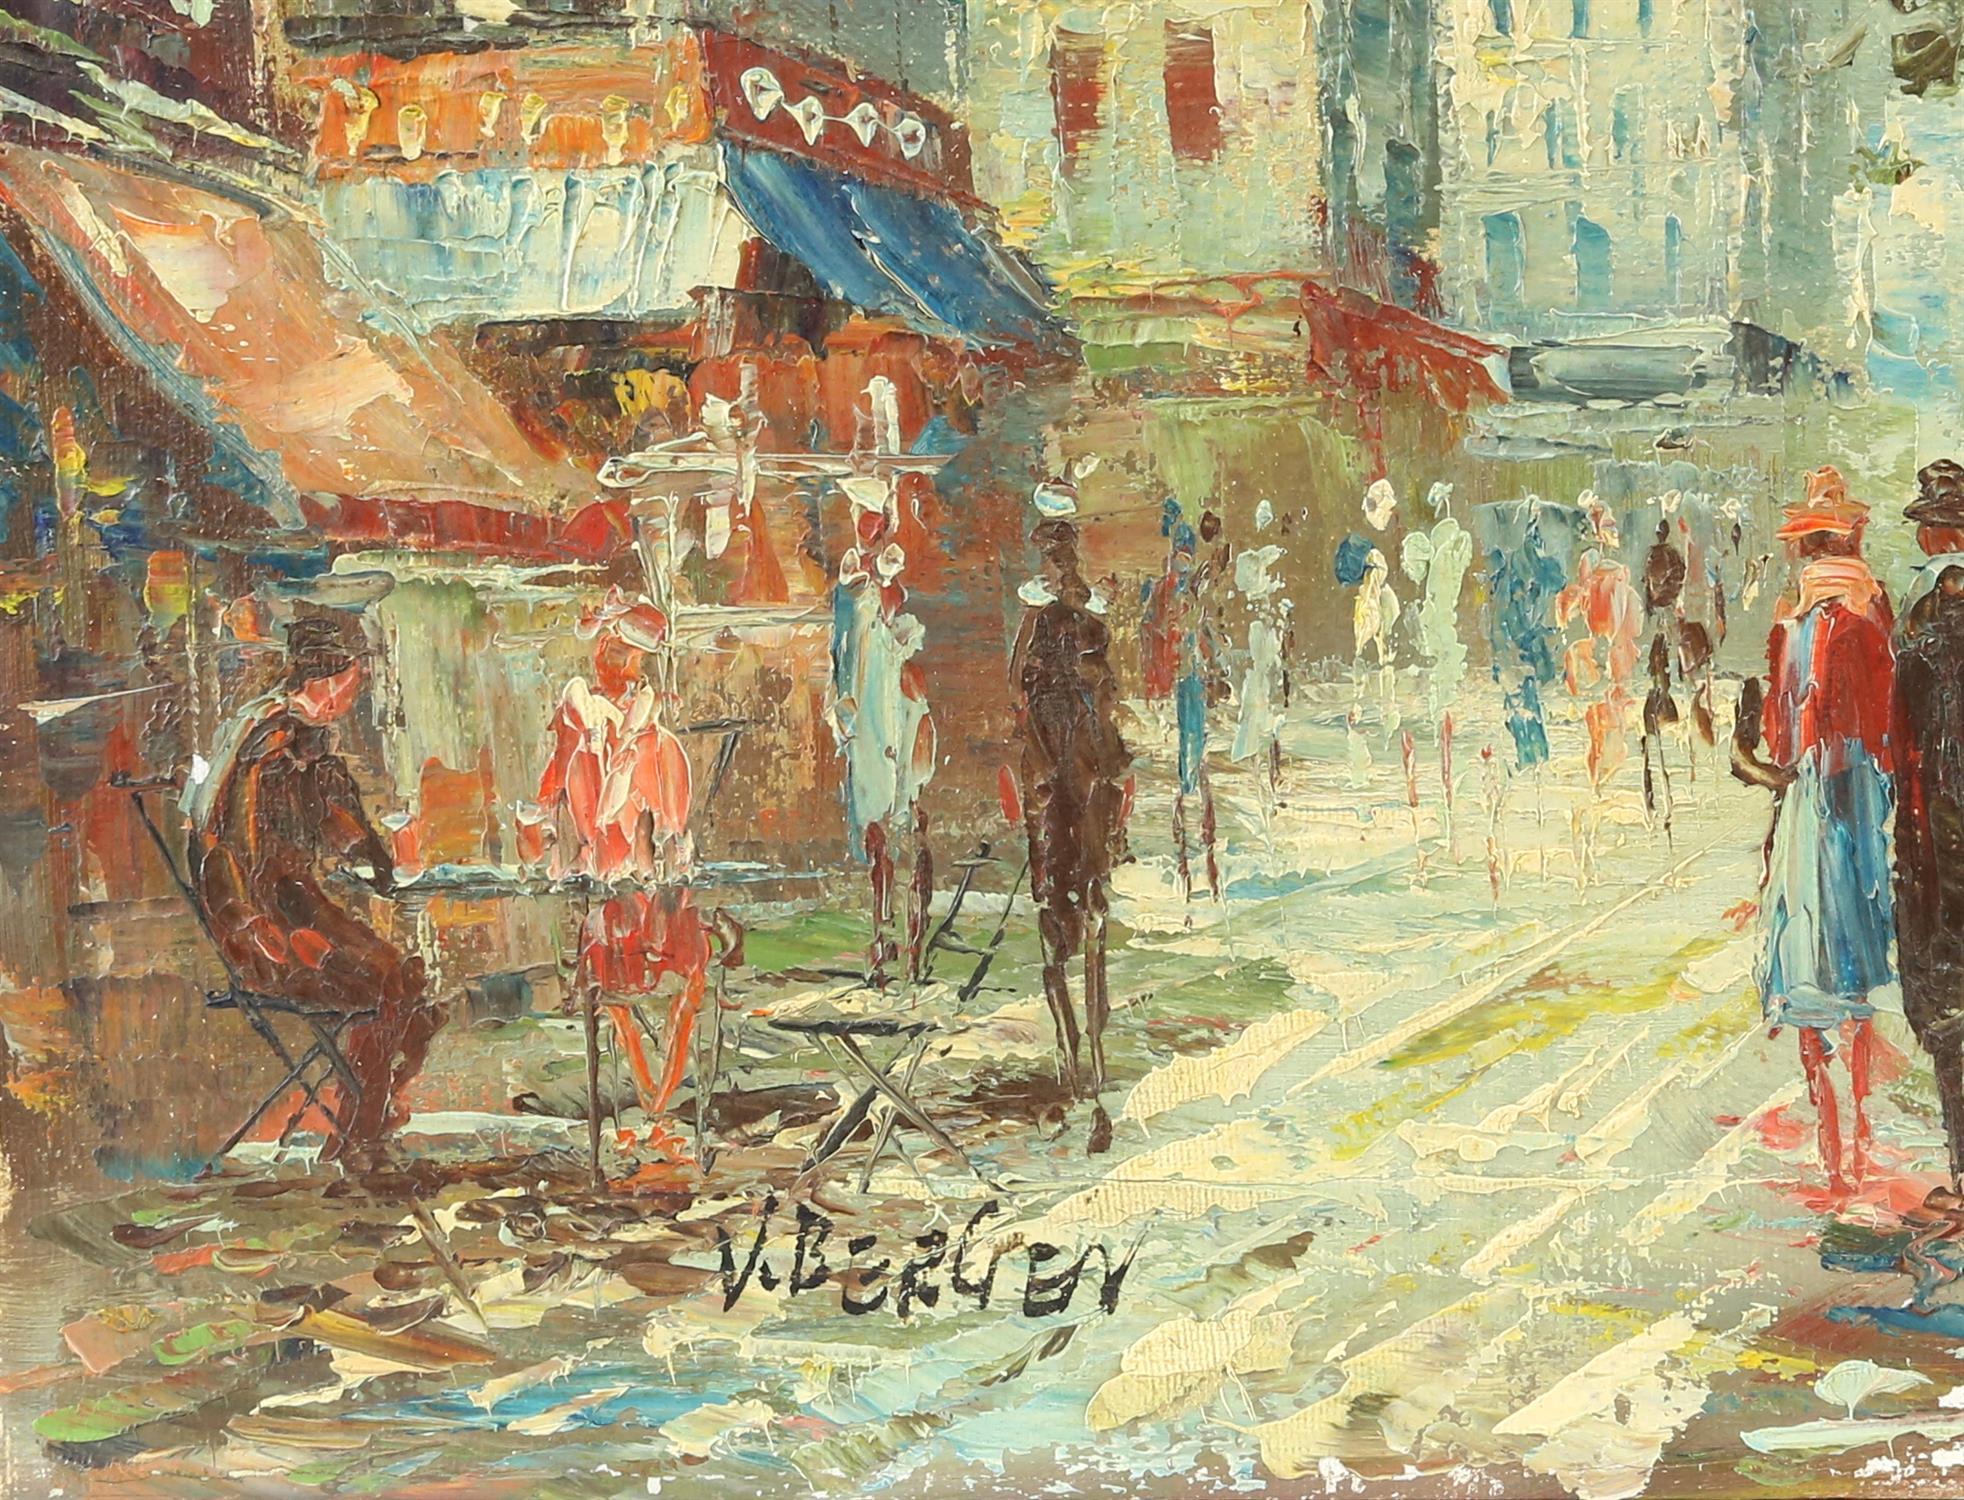 V. Bergen (20th century Continental school), pair of small Parisian street scene, oil on canvas, - Image 4 of 7